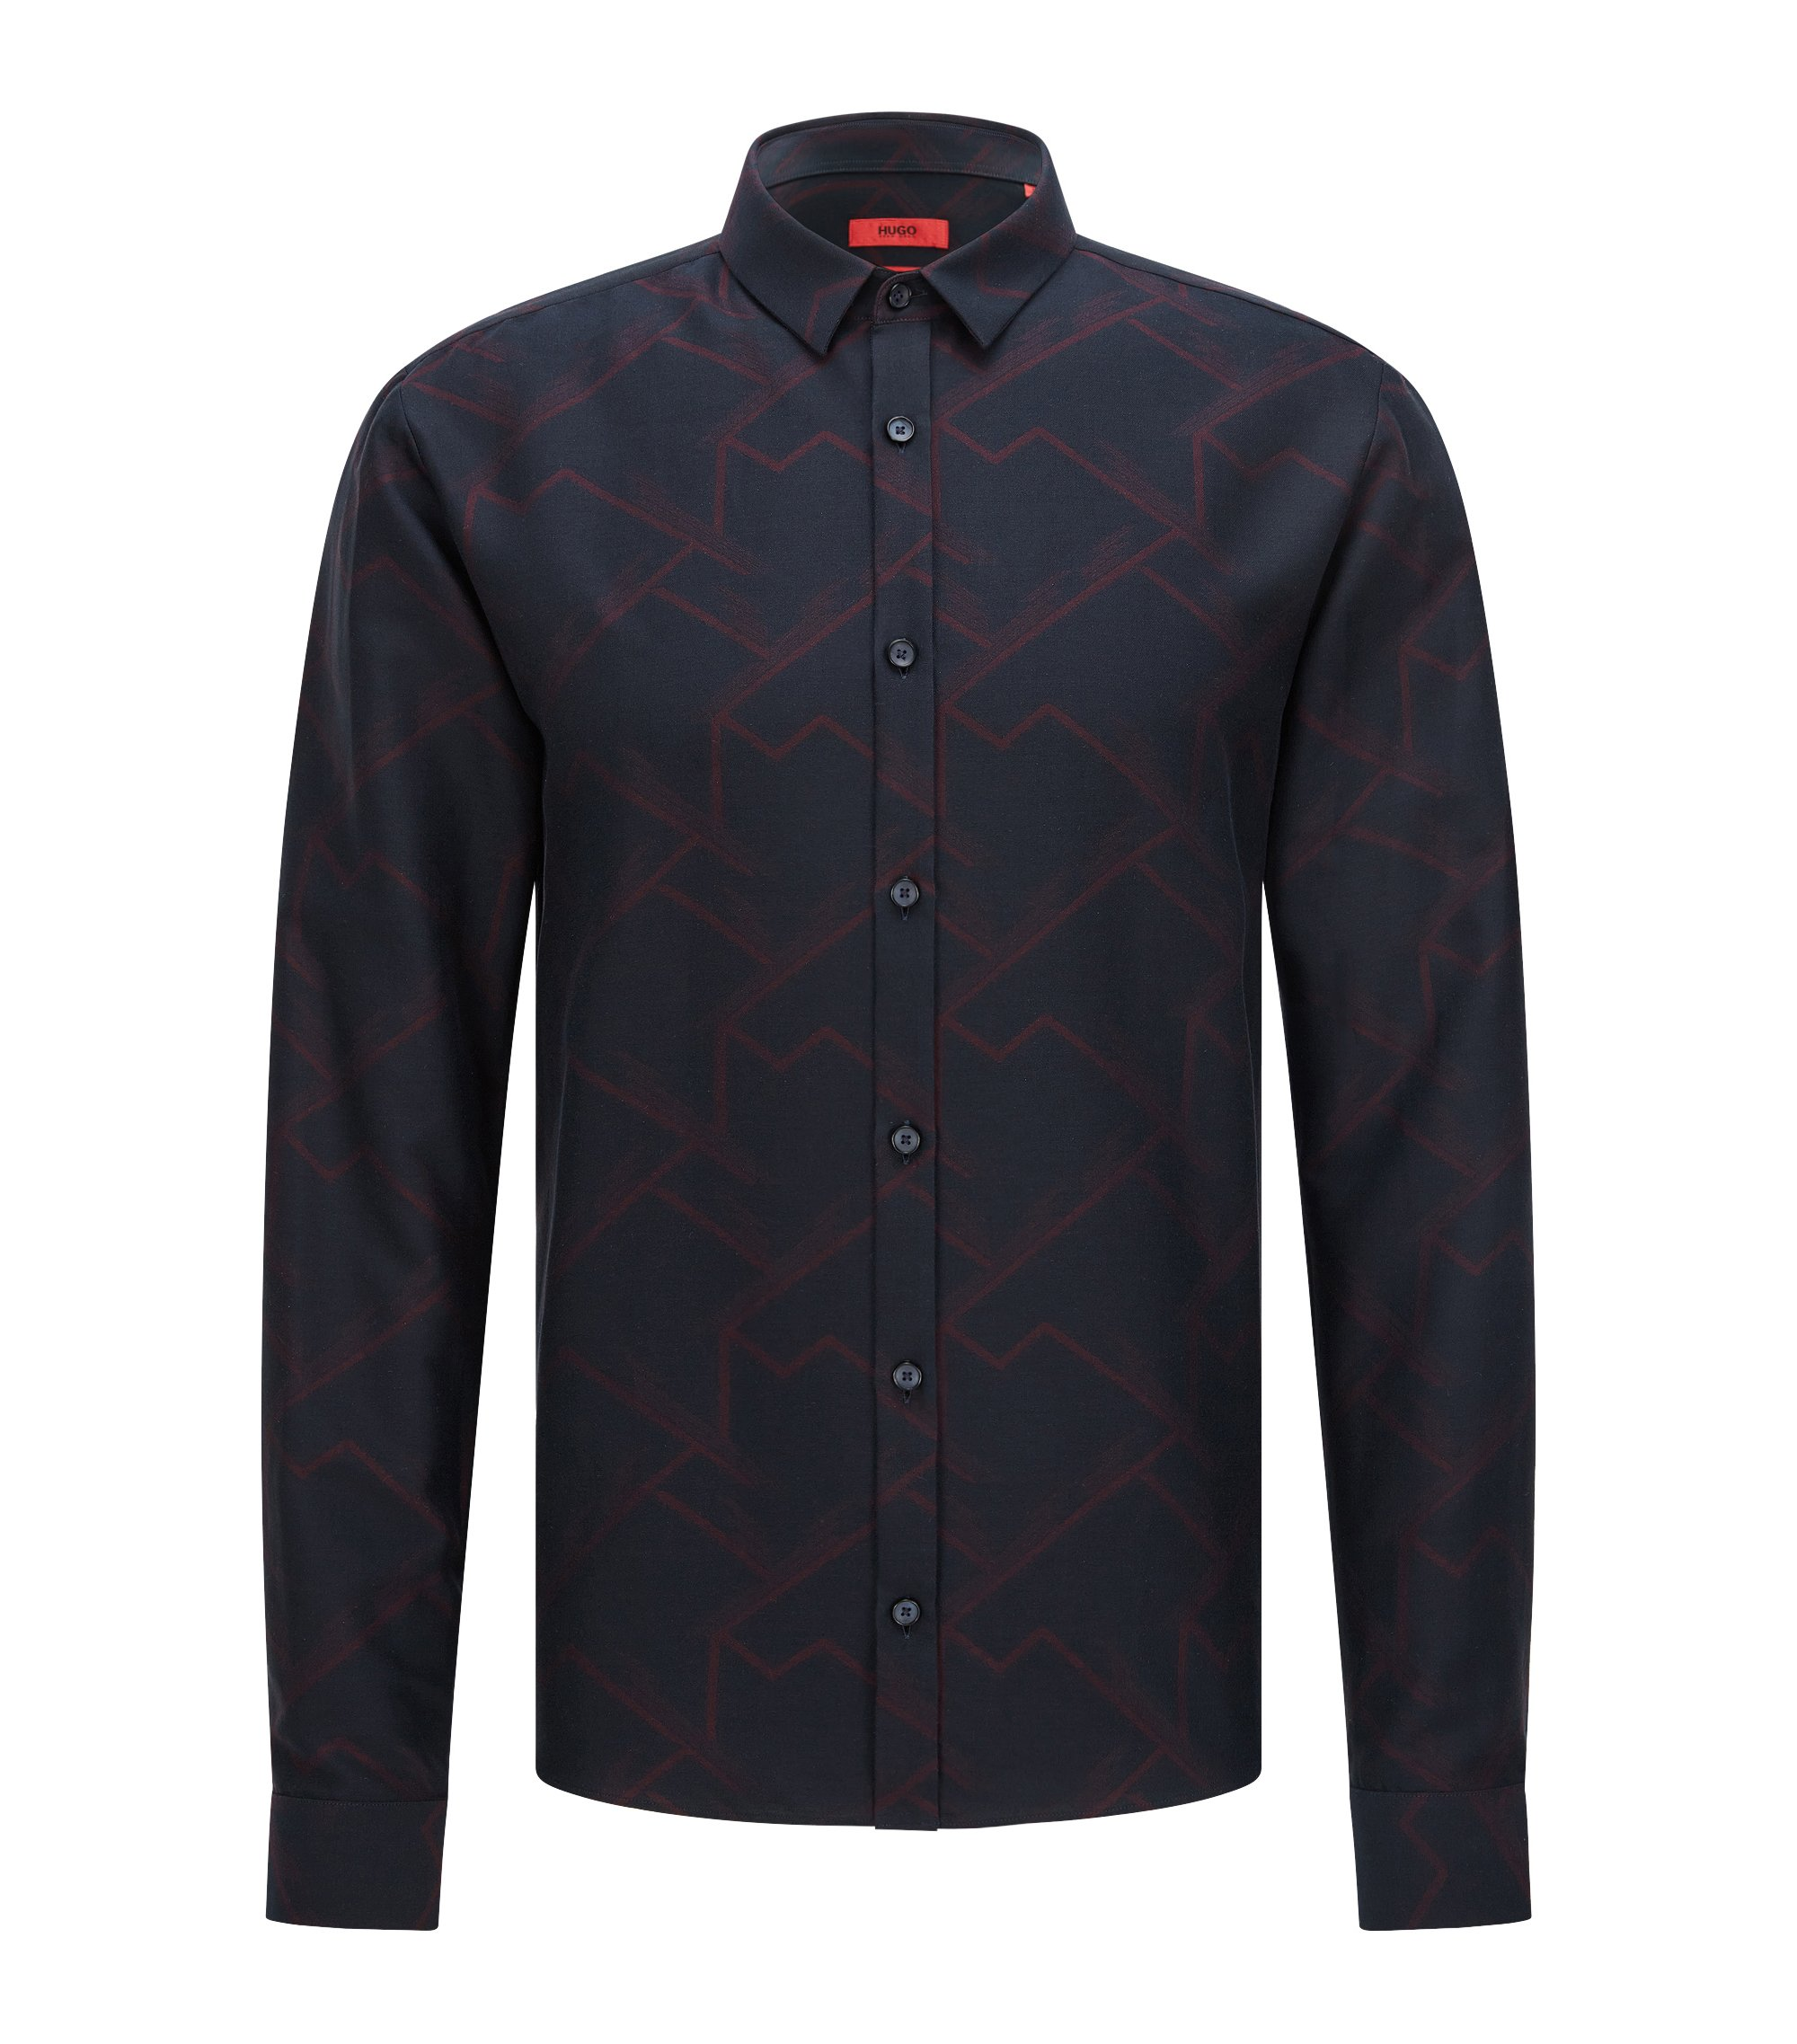 Patterned Cotton Button Down Shirt, Extra Slim Fit | Ero, Dark Blue